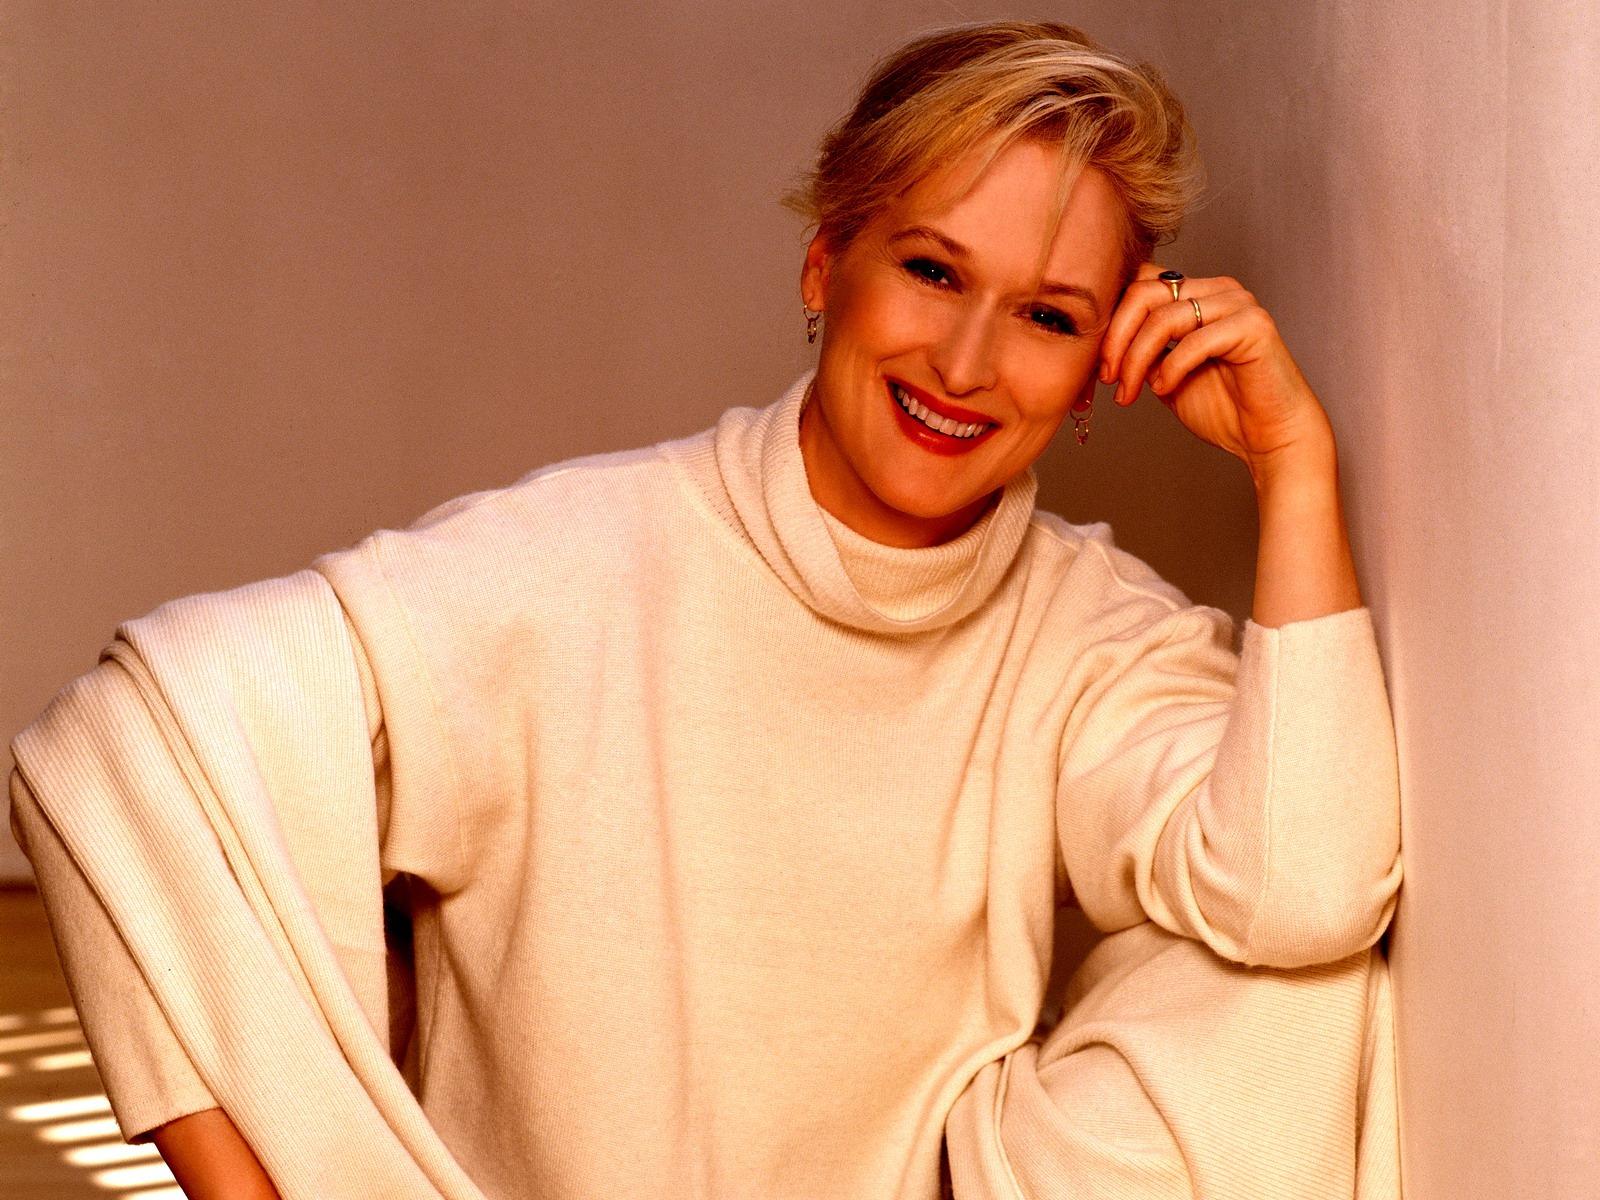 http://3.bp.blogspot.com/-B5fbKYRerlQ/UUG63Cvjj_I/AAAAAAAA284/m4SB-N3HAQw/s1600/Meryl-Streep-in-white.jpg